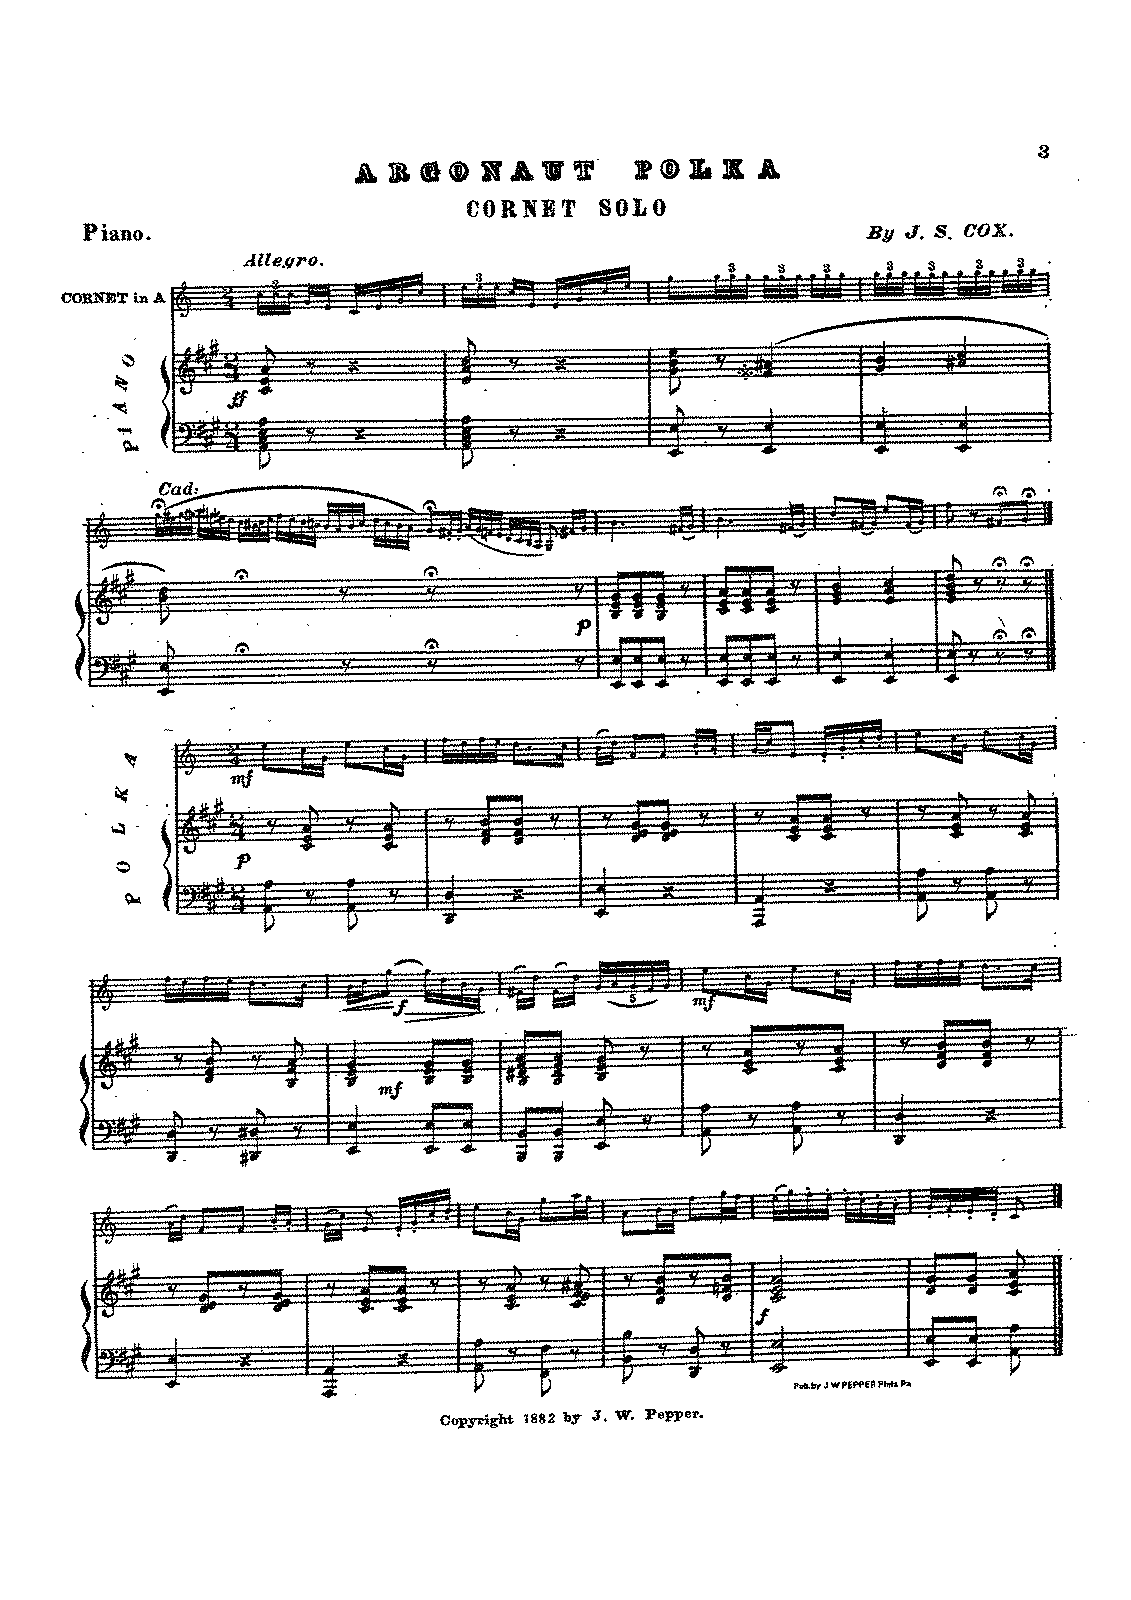 Argonaut Polka (Cox, John Summers) - IMSLP/Petrucci Music Library